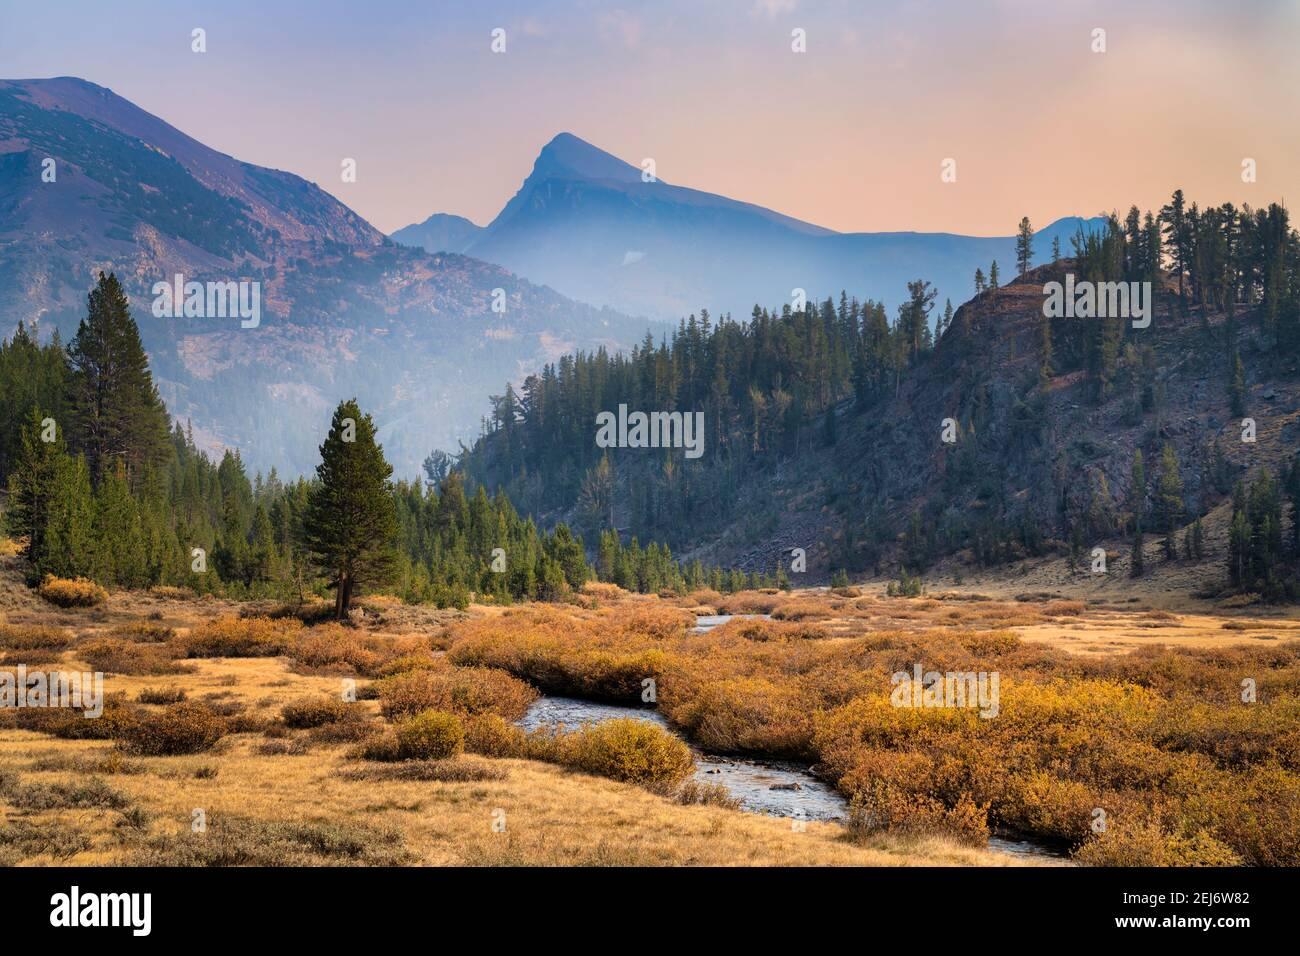 Arroyo de montaña Foto de stock